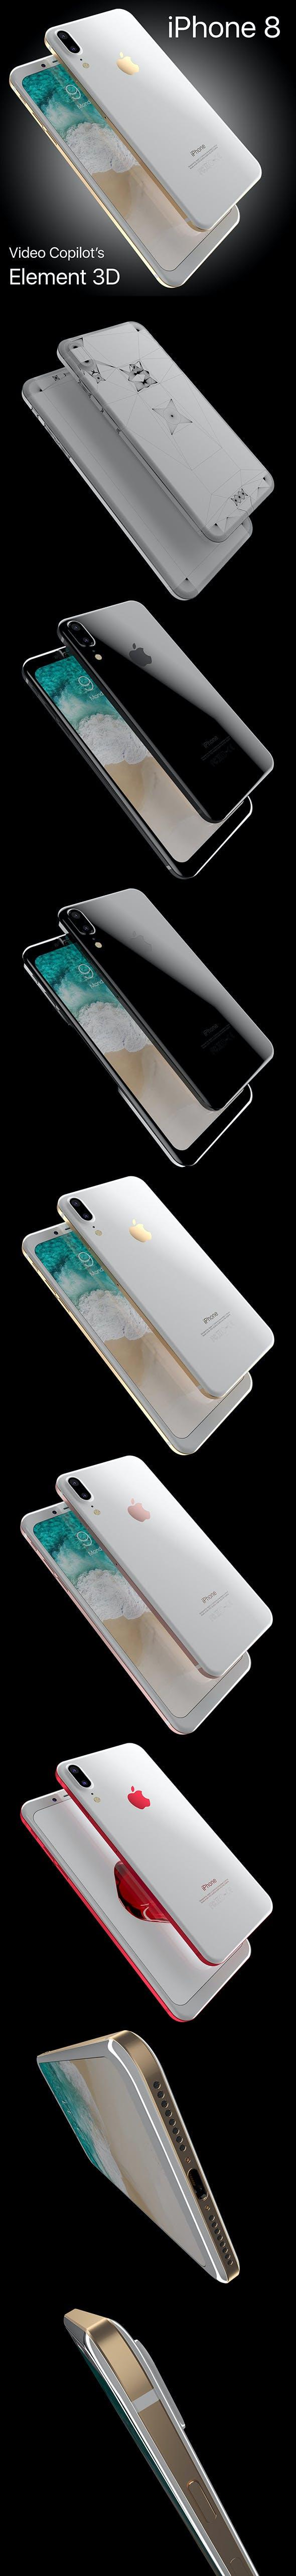 Apple iPhone 8 X Concept Leak Corner edges All Colors - 3DOcean Item for Sale